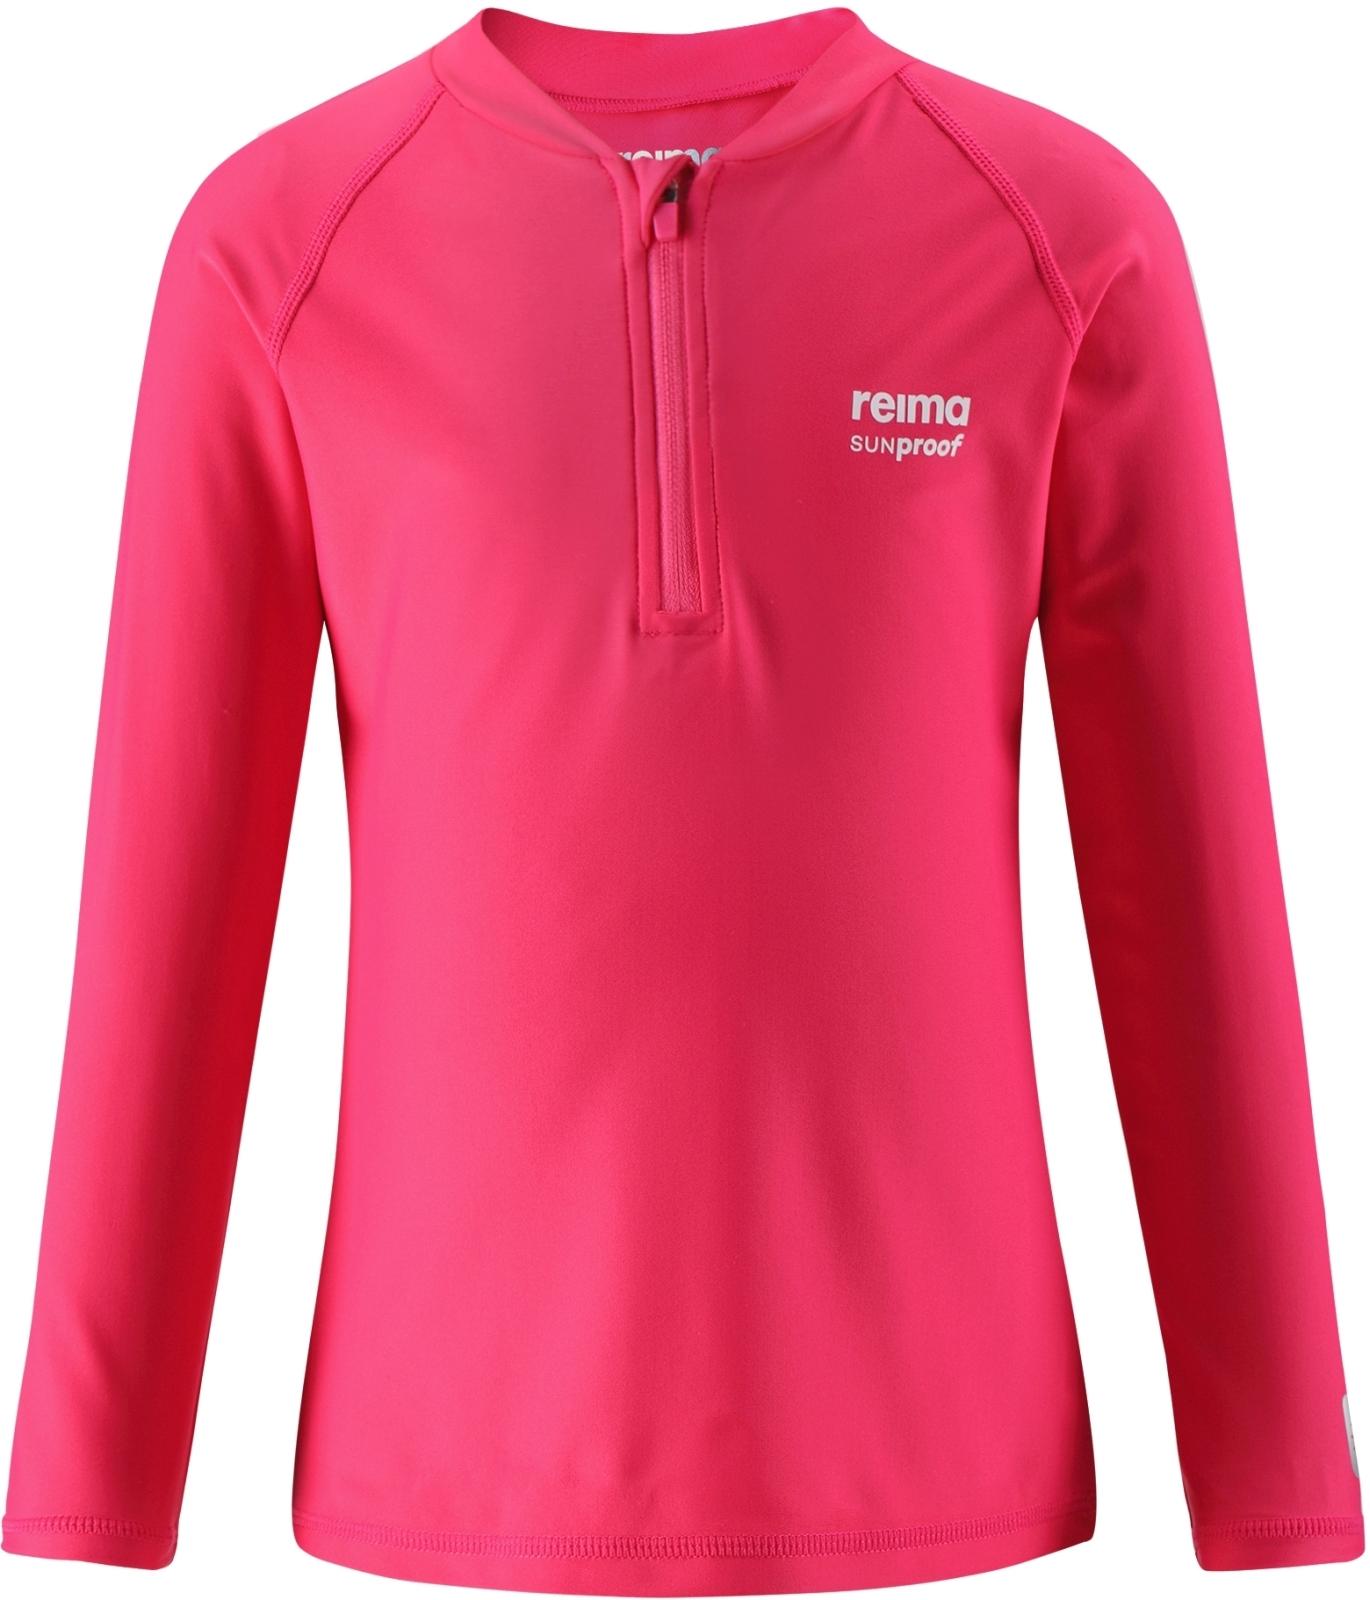 Reima Solomon - candy pink 92 Reima